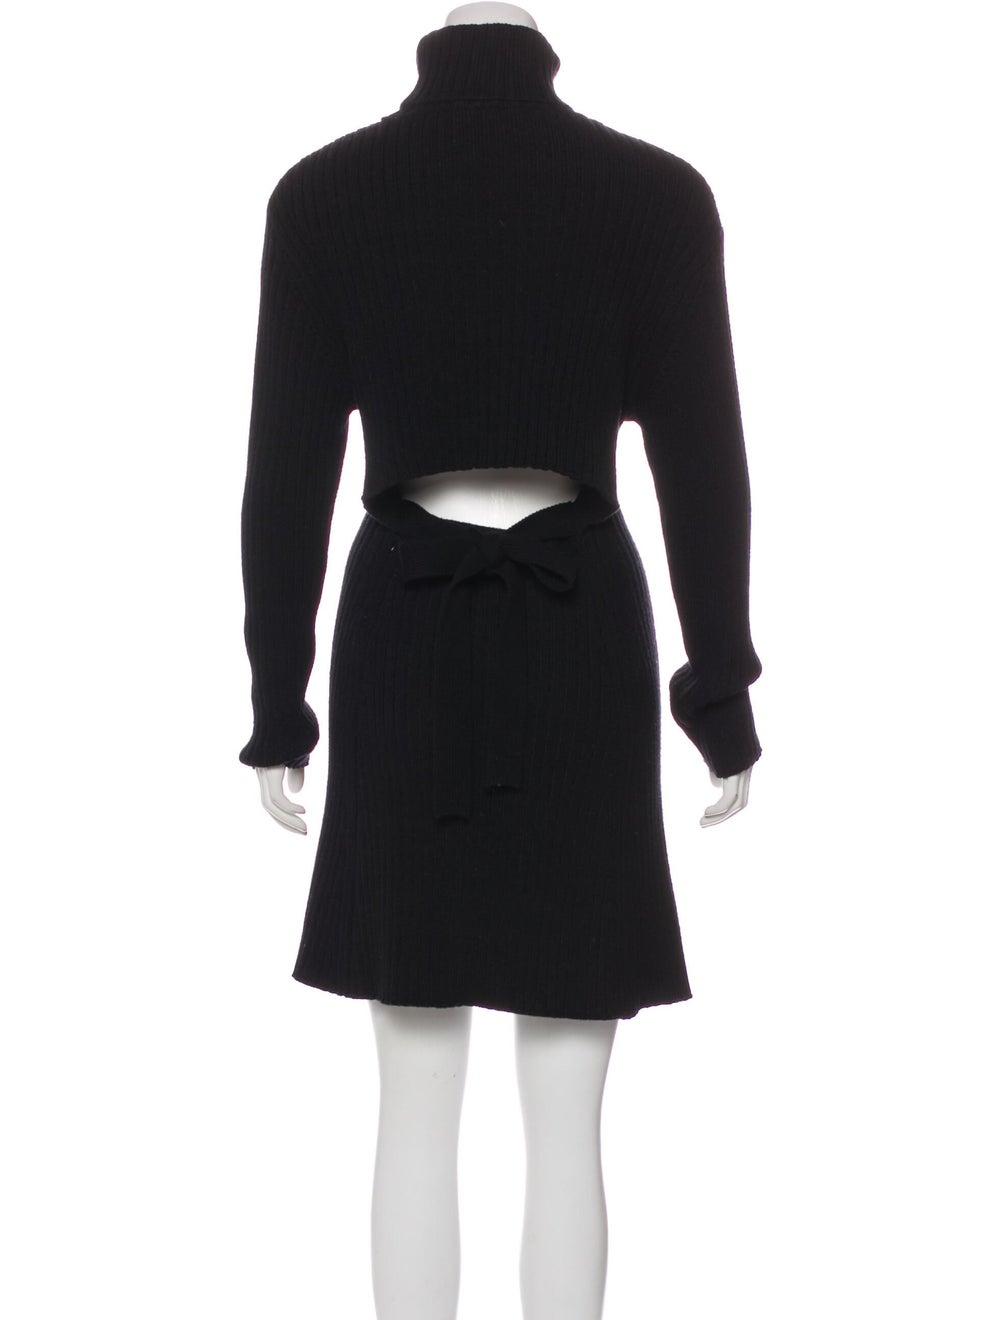 Proenza Schouler Wool Sweater Dress Black - image 3